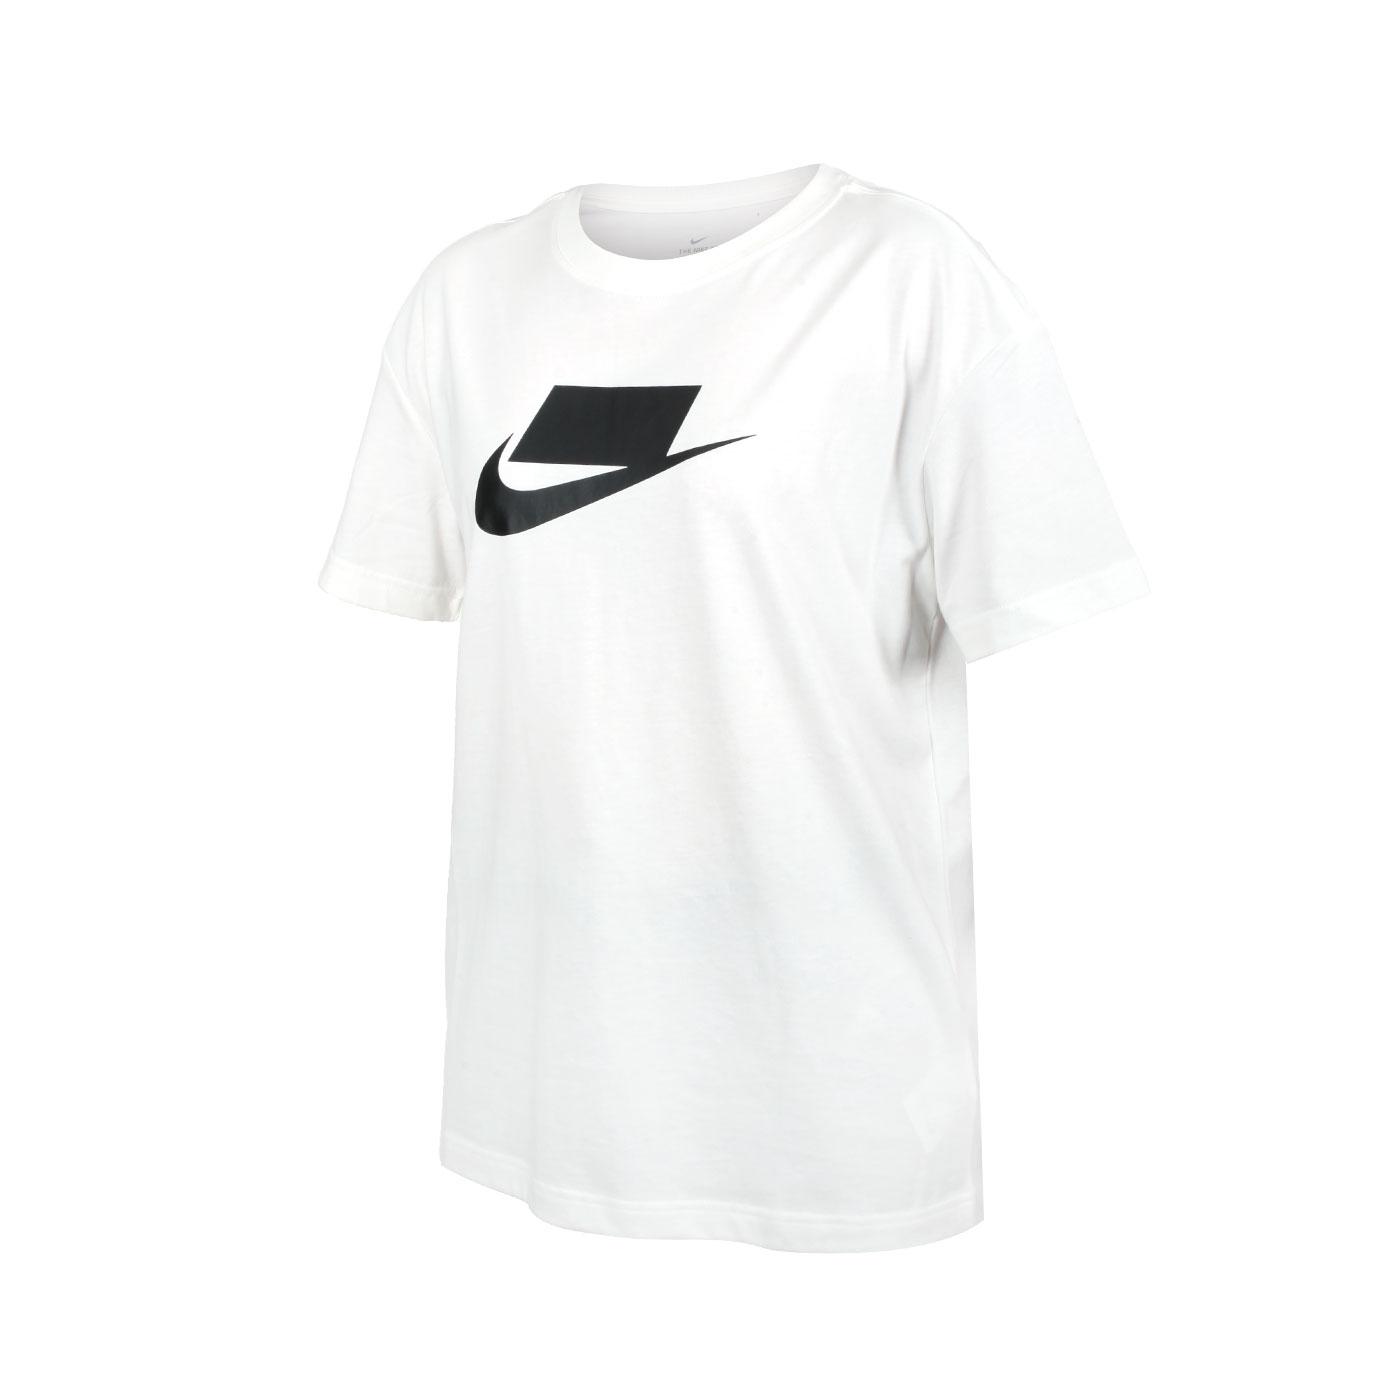 NIKE 女款短袖T恤 DB9828-100